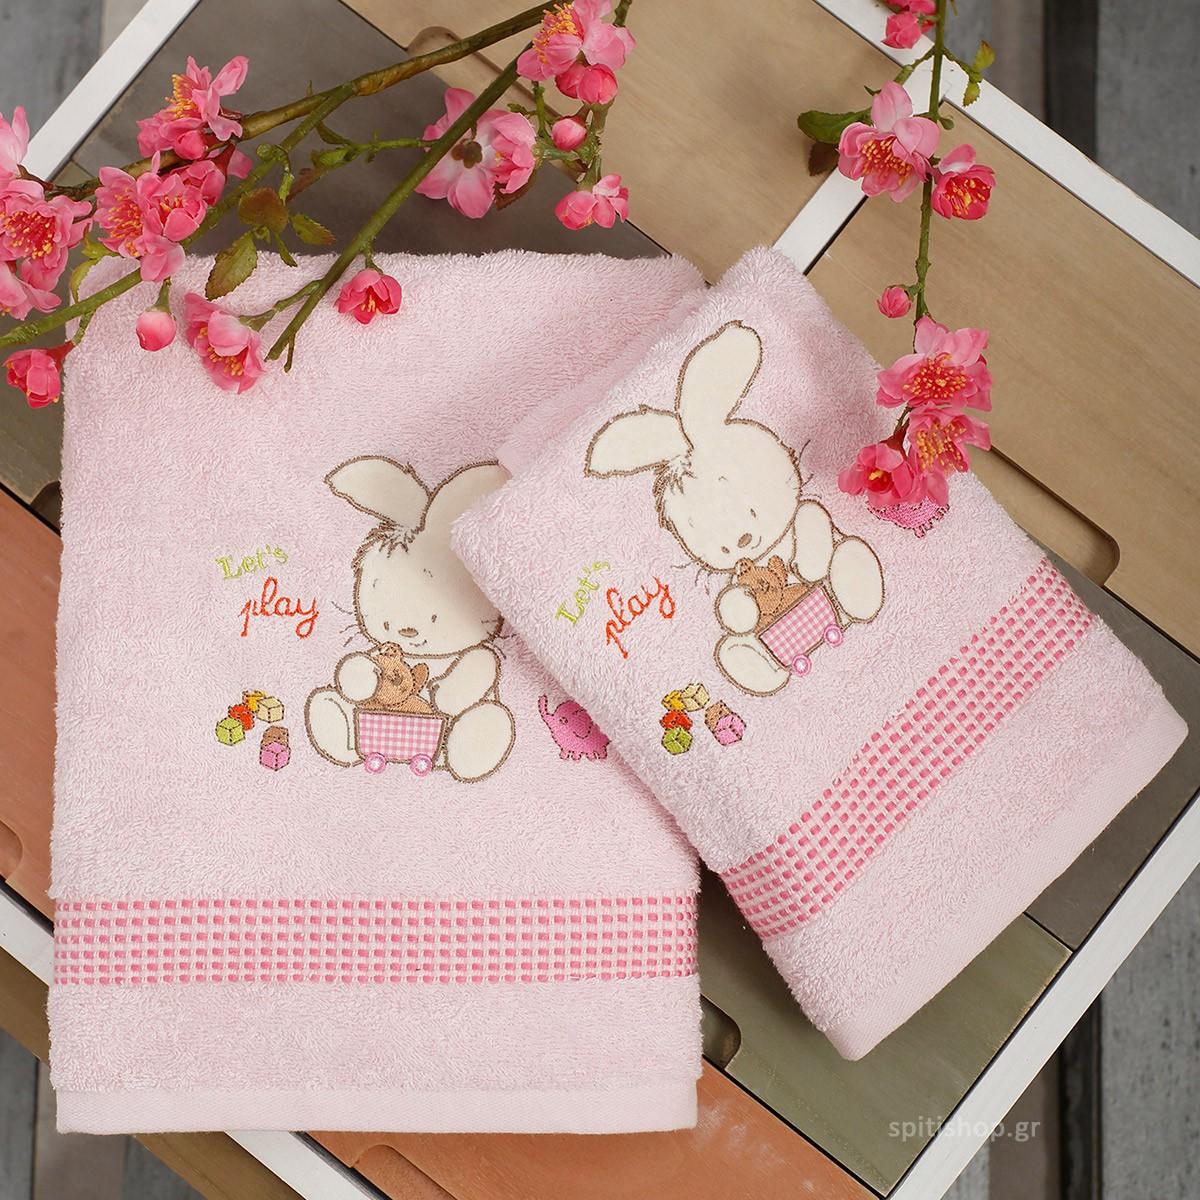 42c0fee2b8c Βρεφικές Πετσέτες (Σετ 2τμχ) Sb Home Bunny Pink